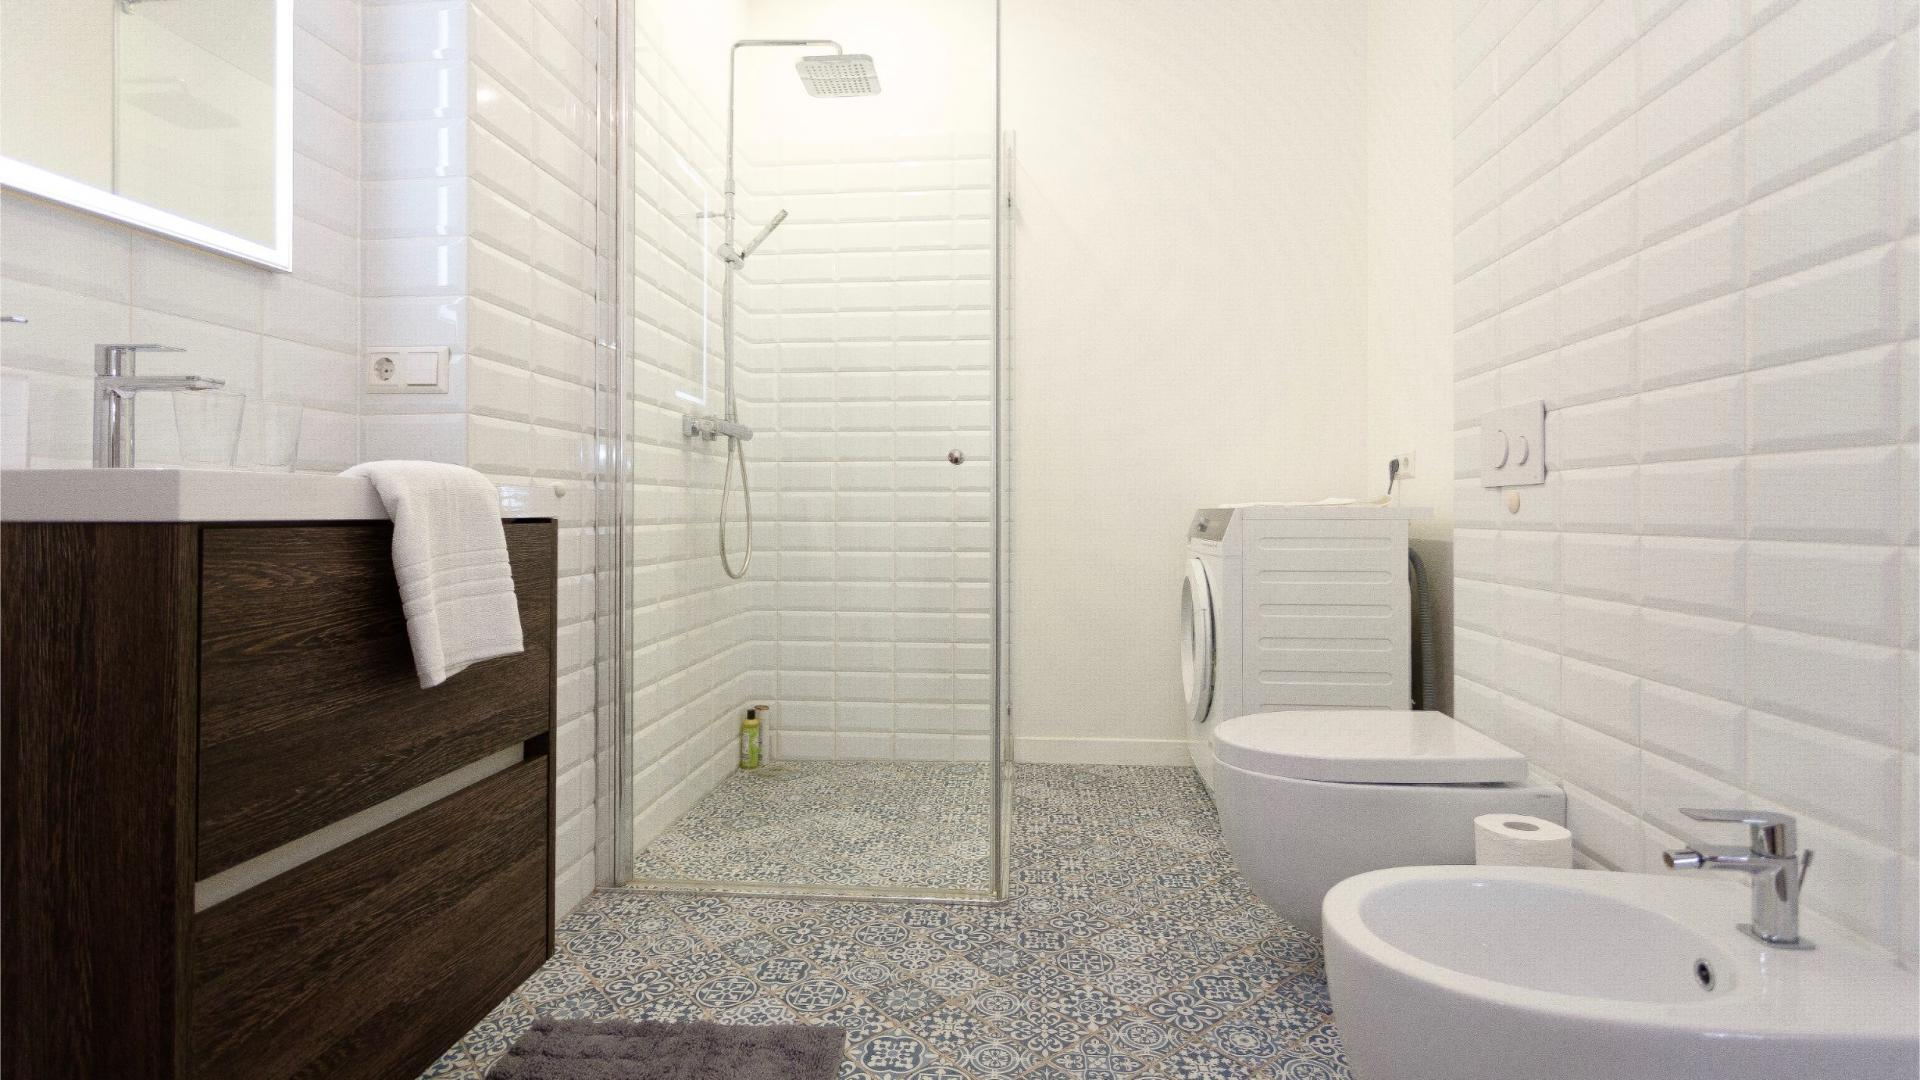 Bathroom at Siauliu Town Hall Apartment